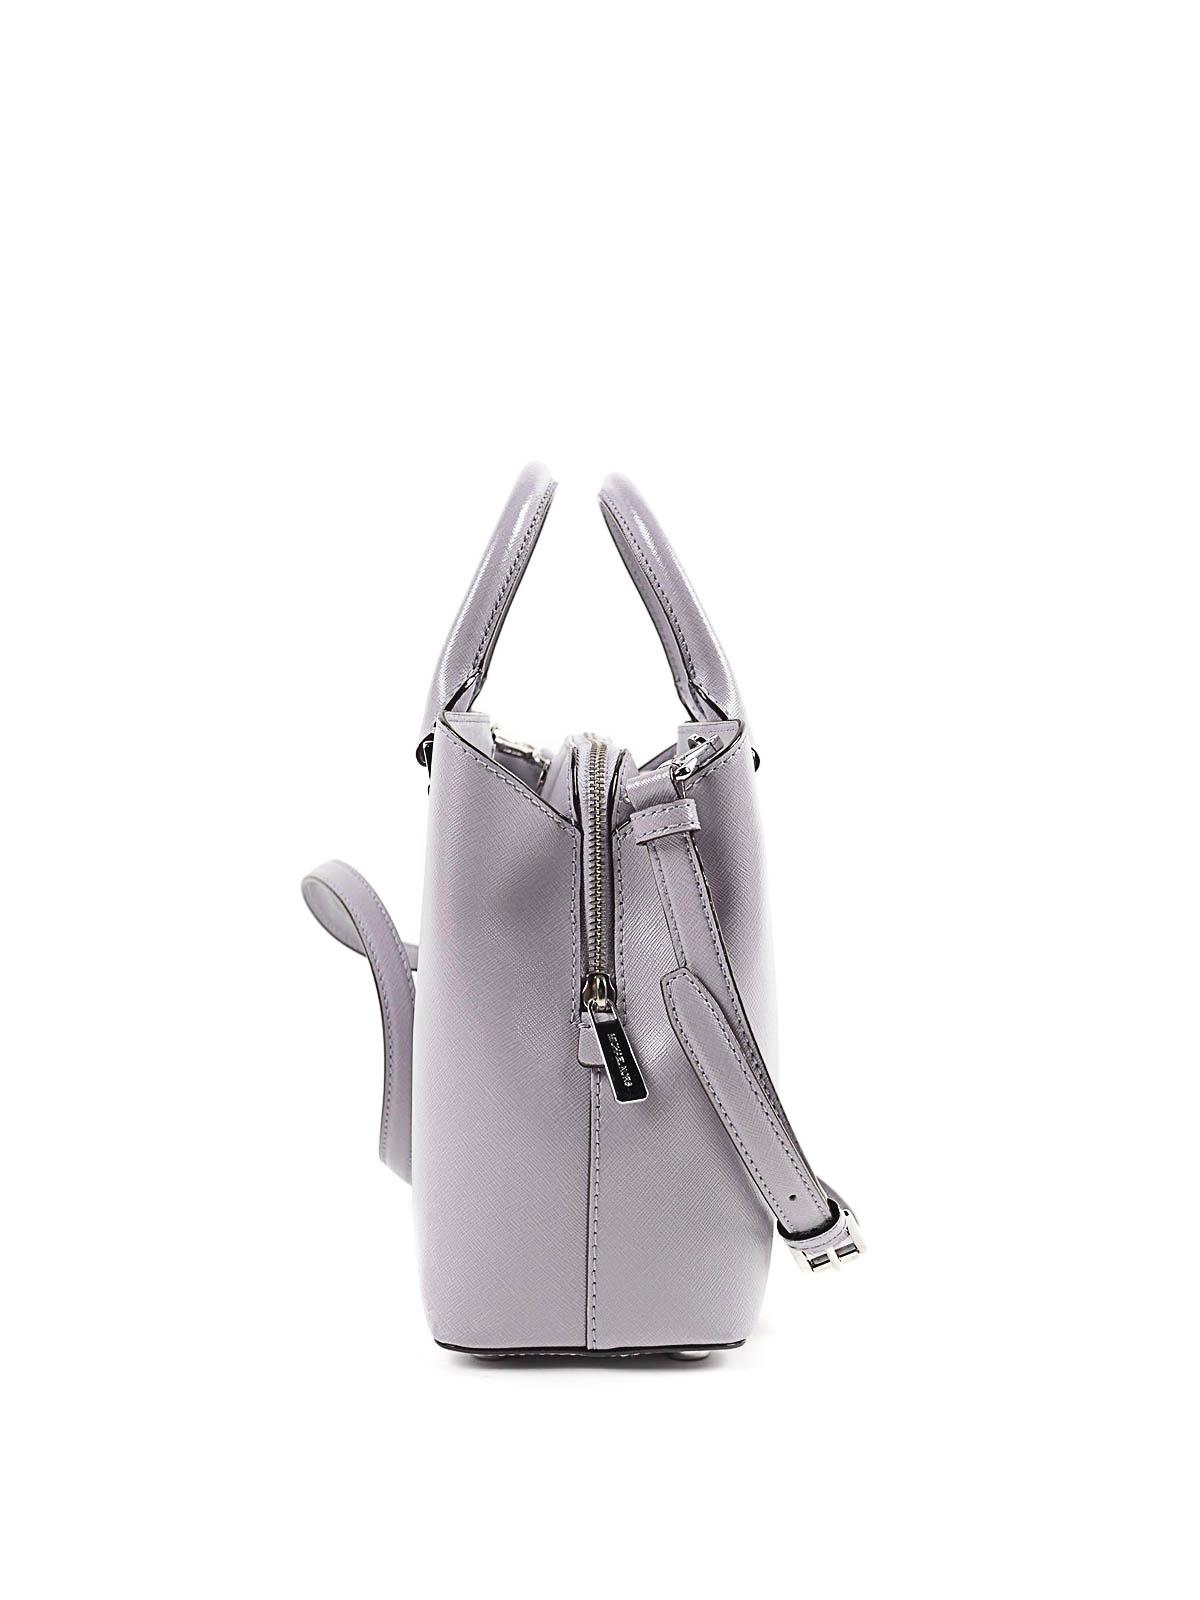 f3782b0d3c2d Michael Kors - Savannah medium satchel - totes bags - 30S6SS7S2A 502